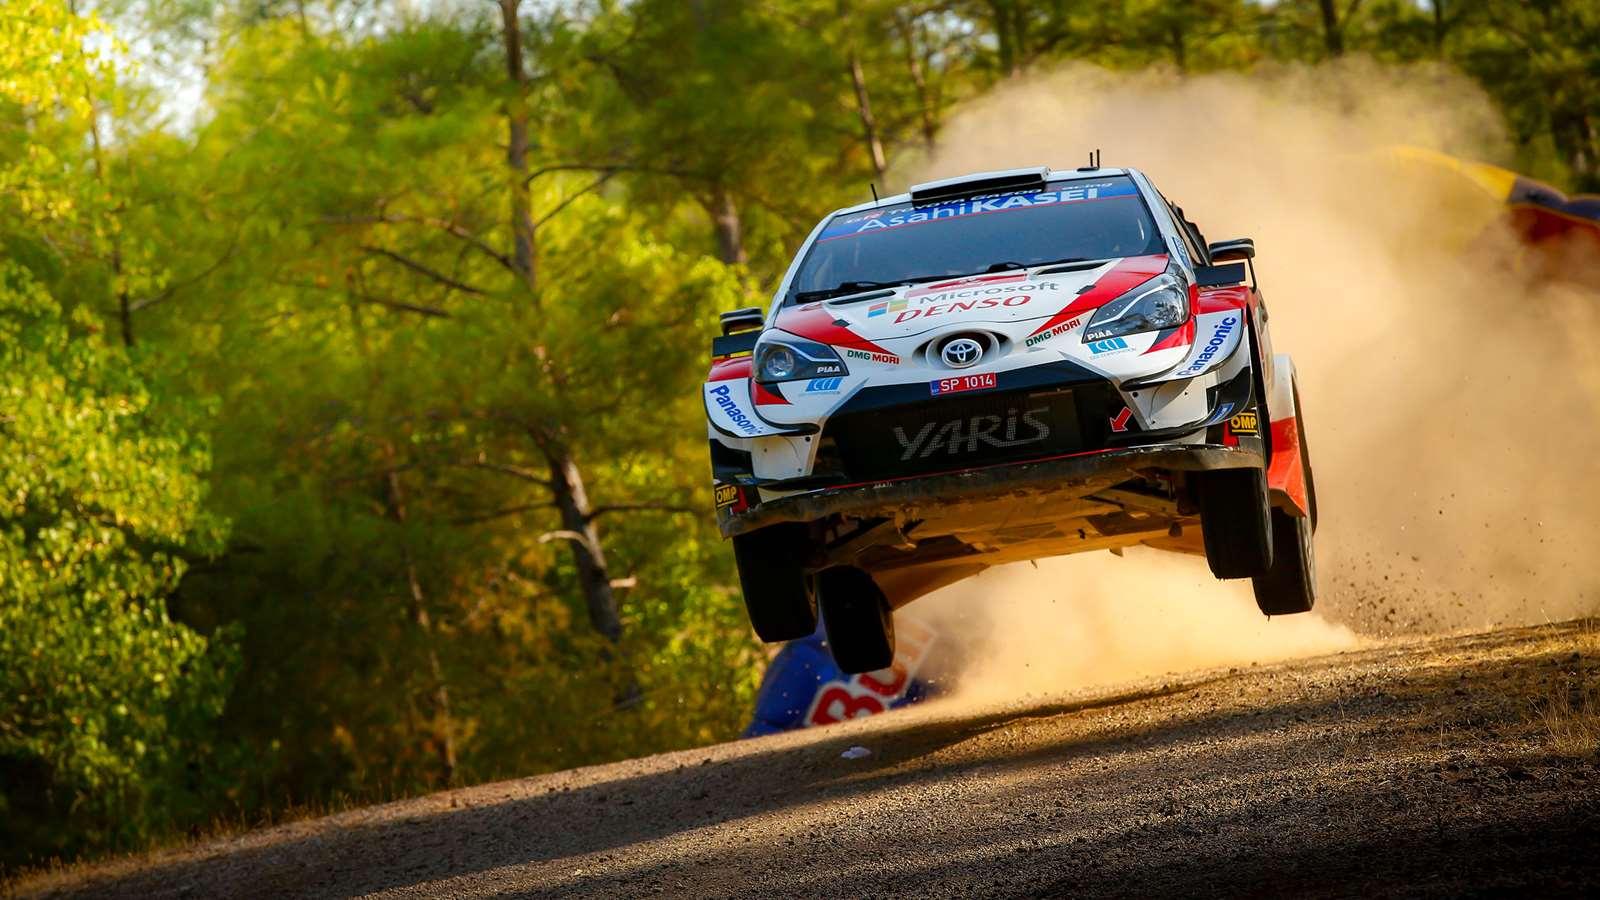 2021 WRC Calendar announced | GRR